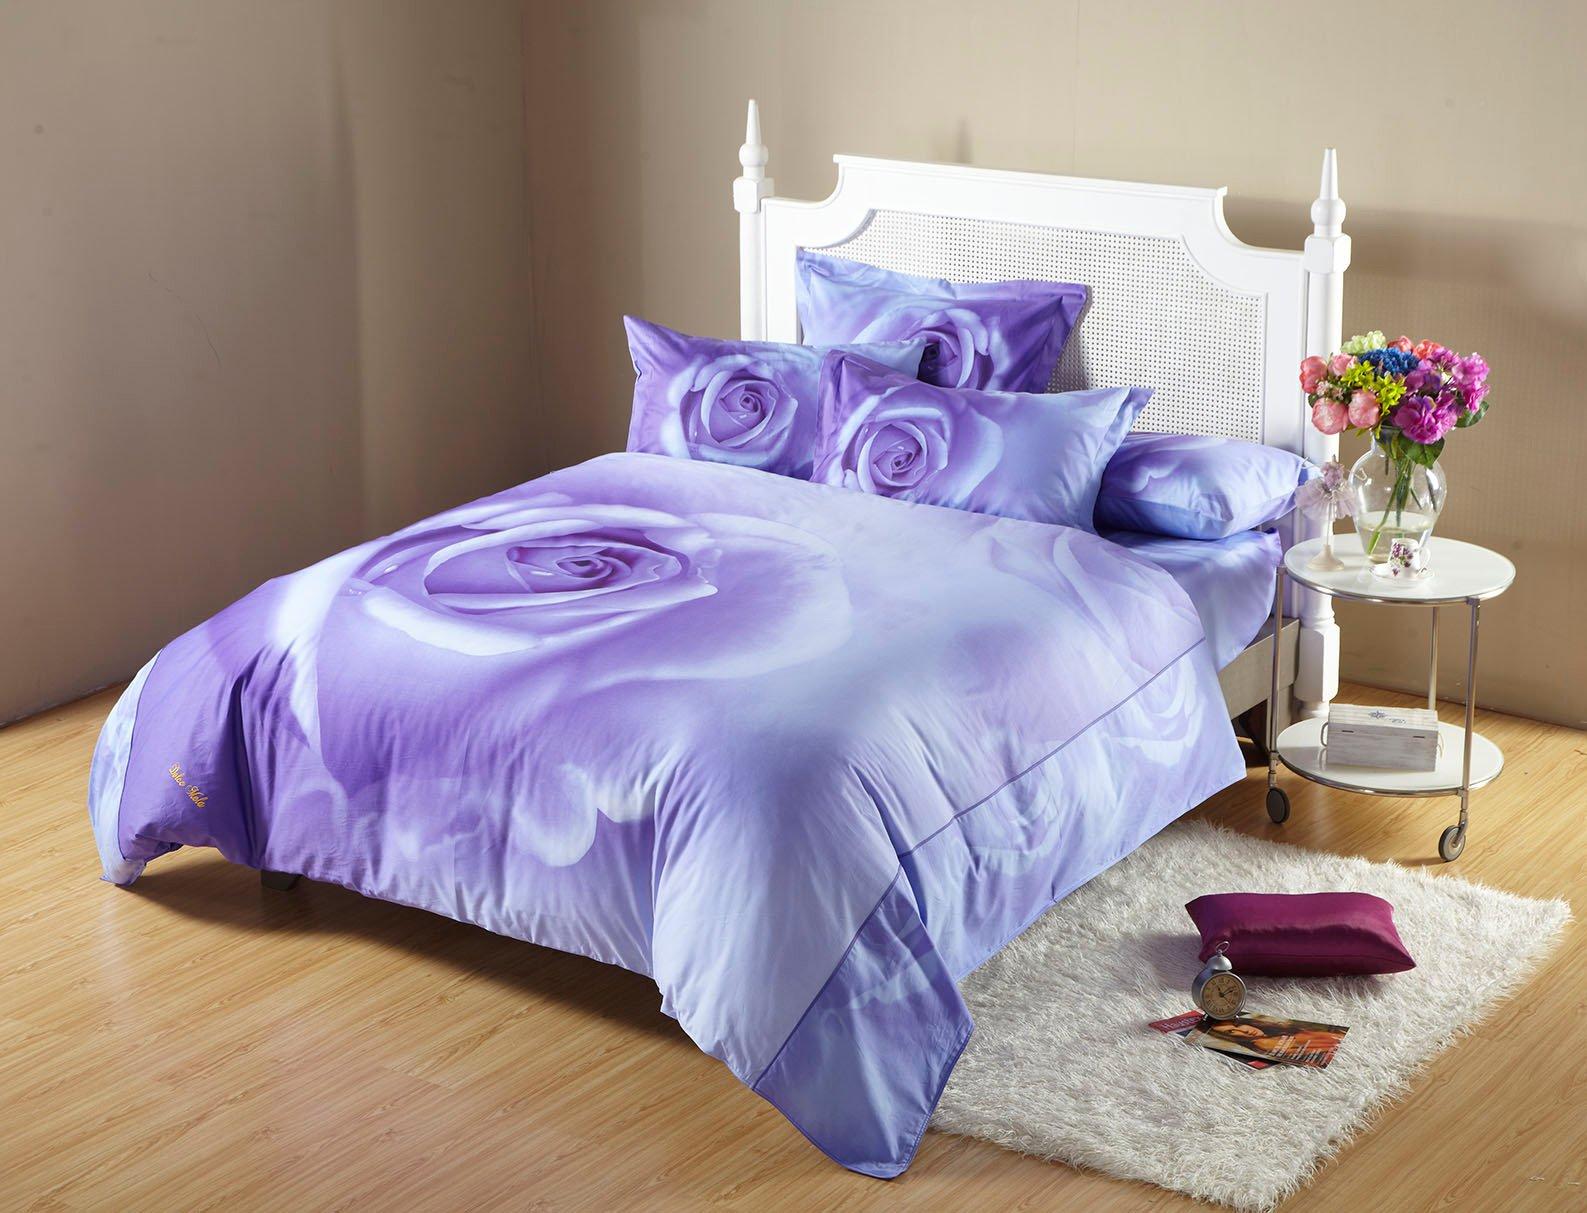 Midnight Rose Queen Bedding Romantic Print Luxury Duvet